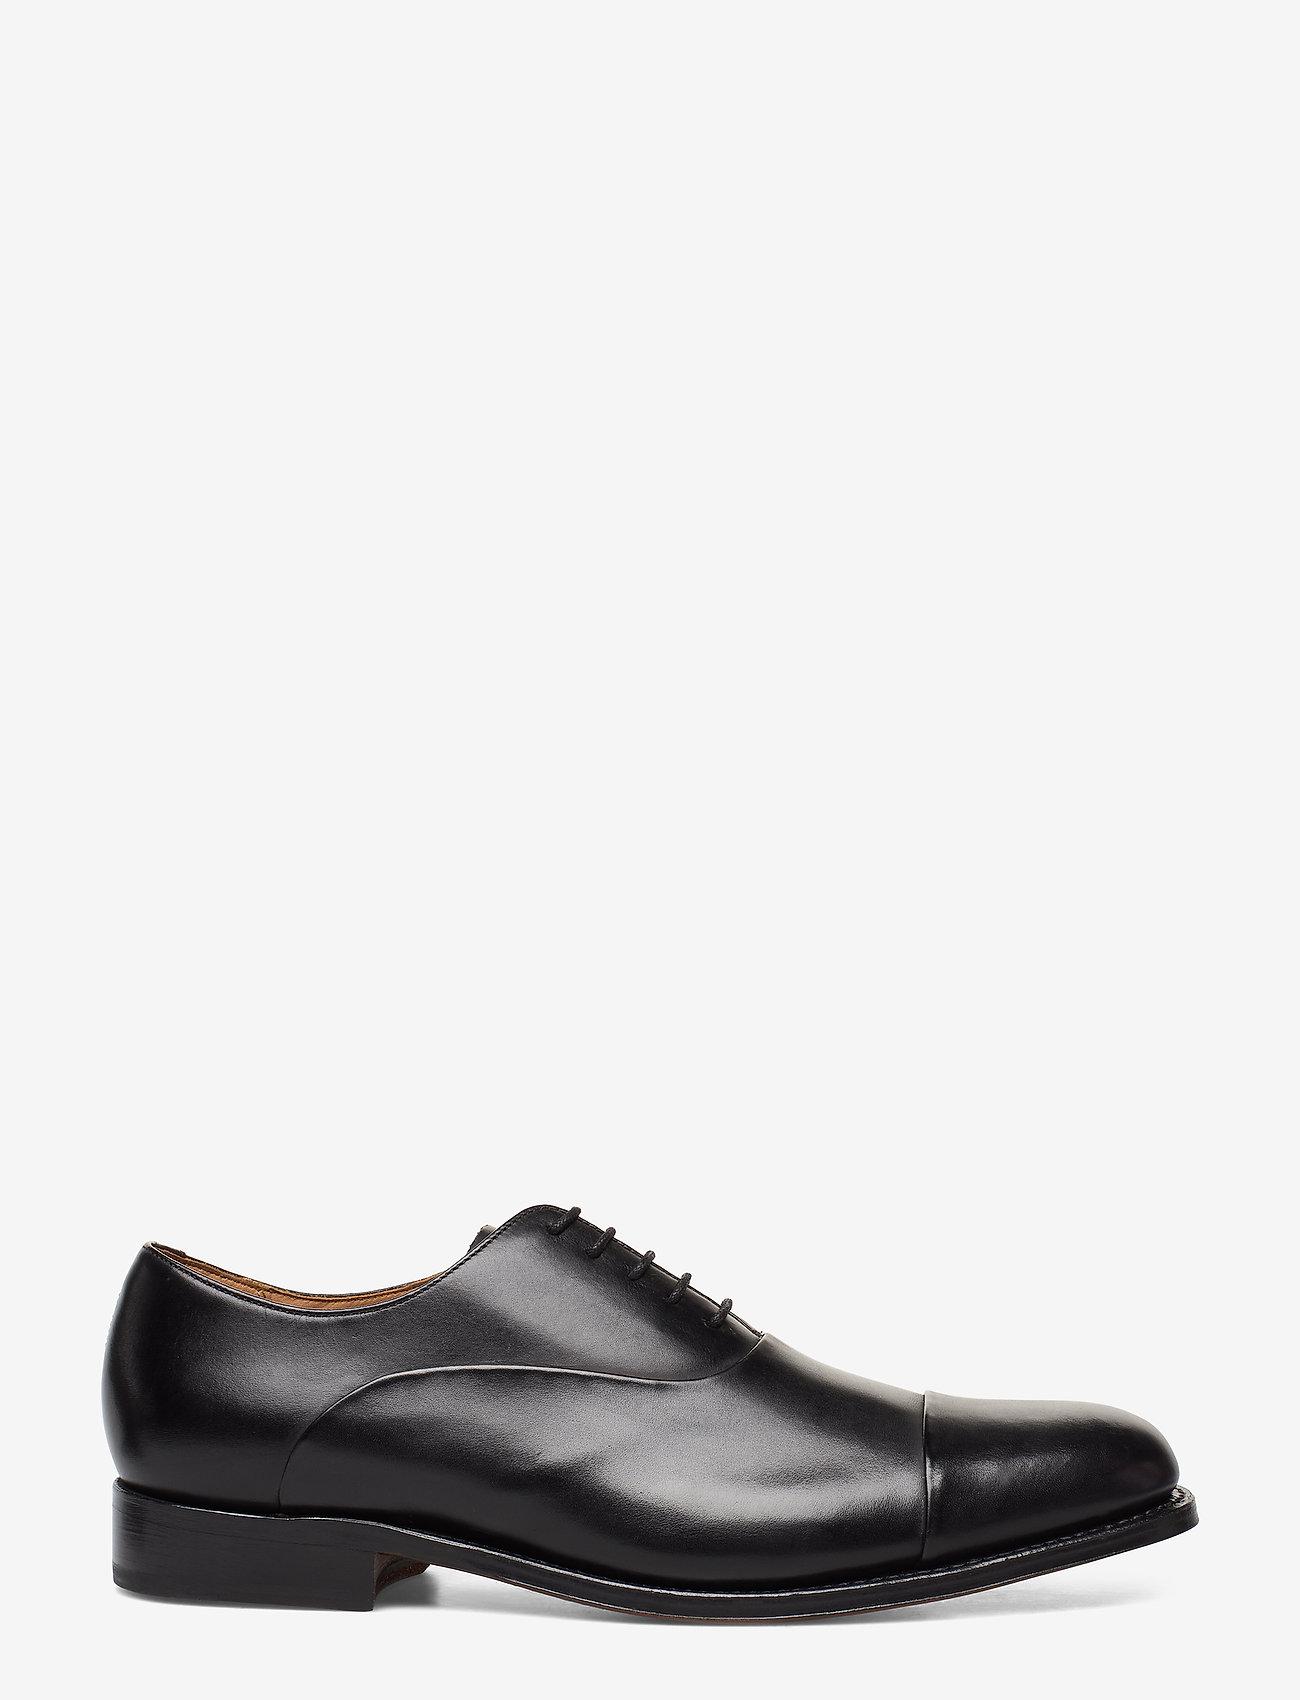 Grenson - BERT - buty ze skóry lakierowanej - black - 1